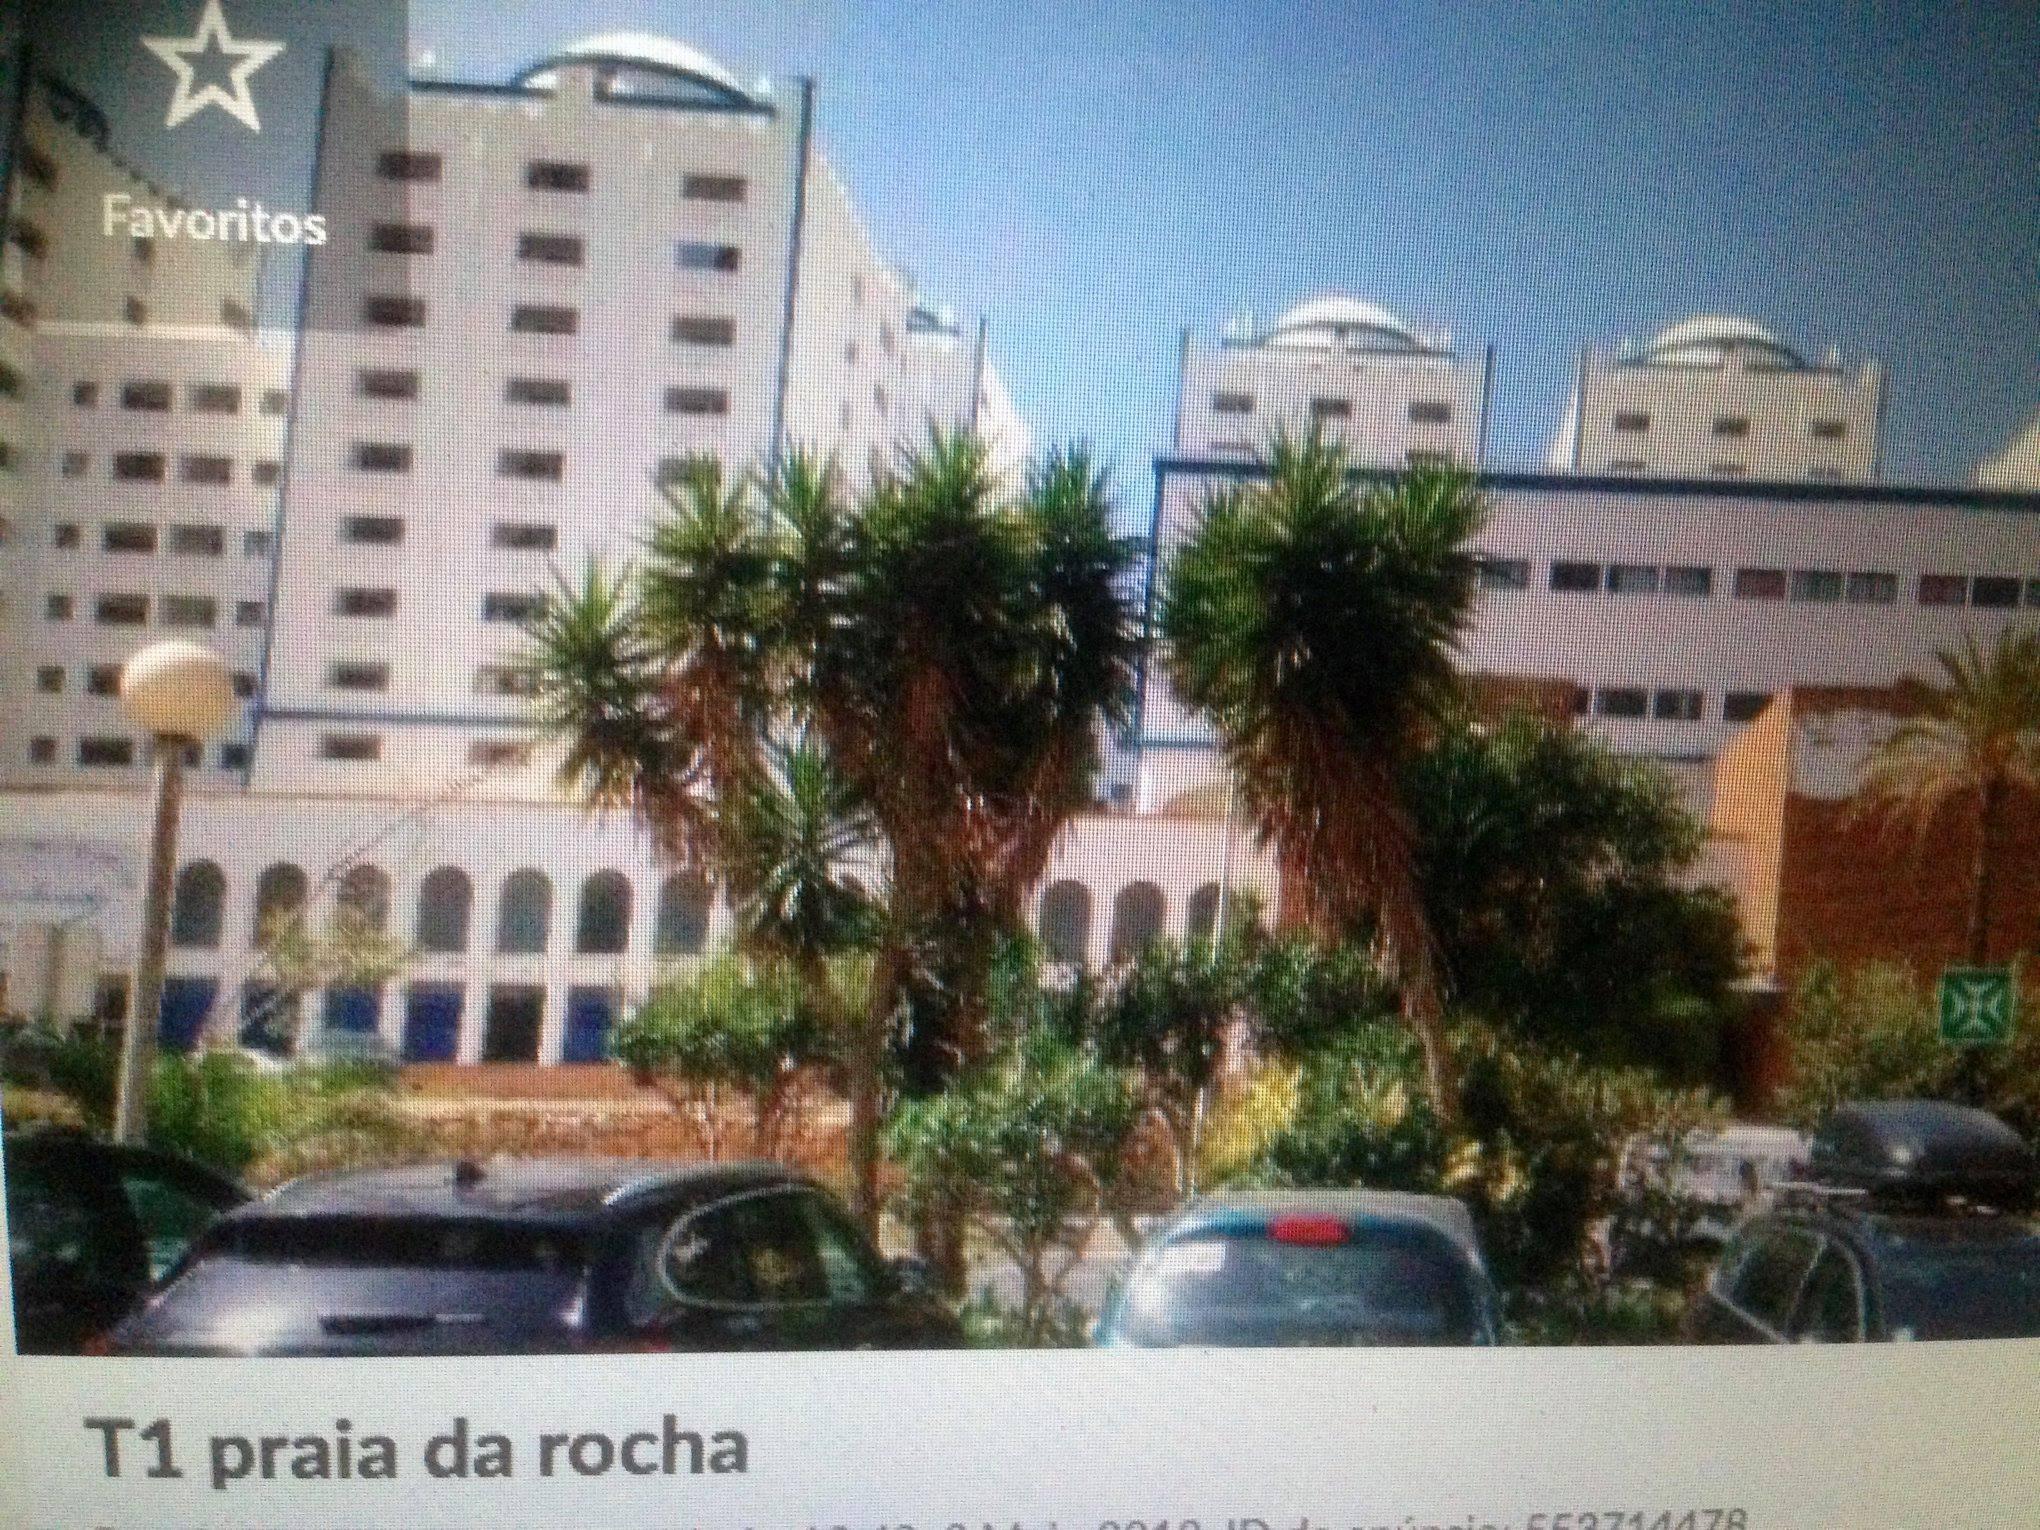 Holiday apartments and villas for rent, Apartamento T1 no Club Praia da Rocha a 250m da Praia. in Portimão, Portugal Algarve, REF_IMG_4486_4532